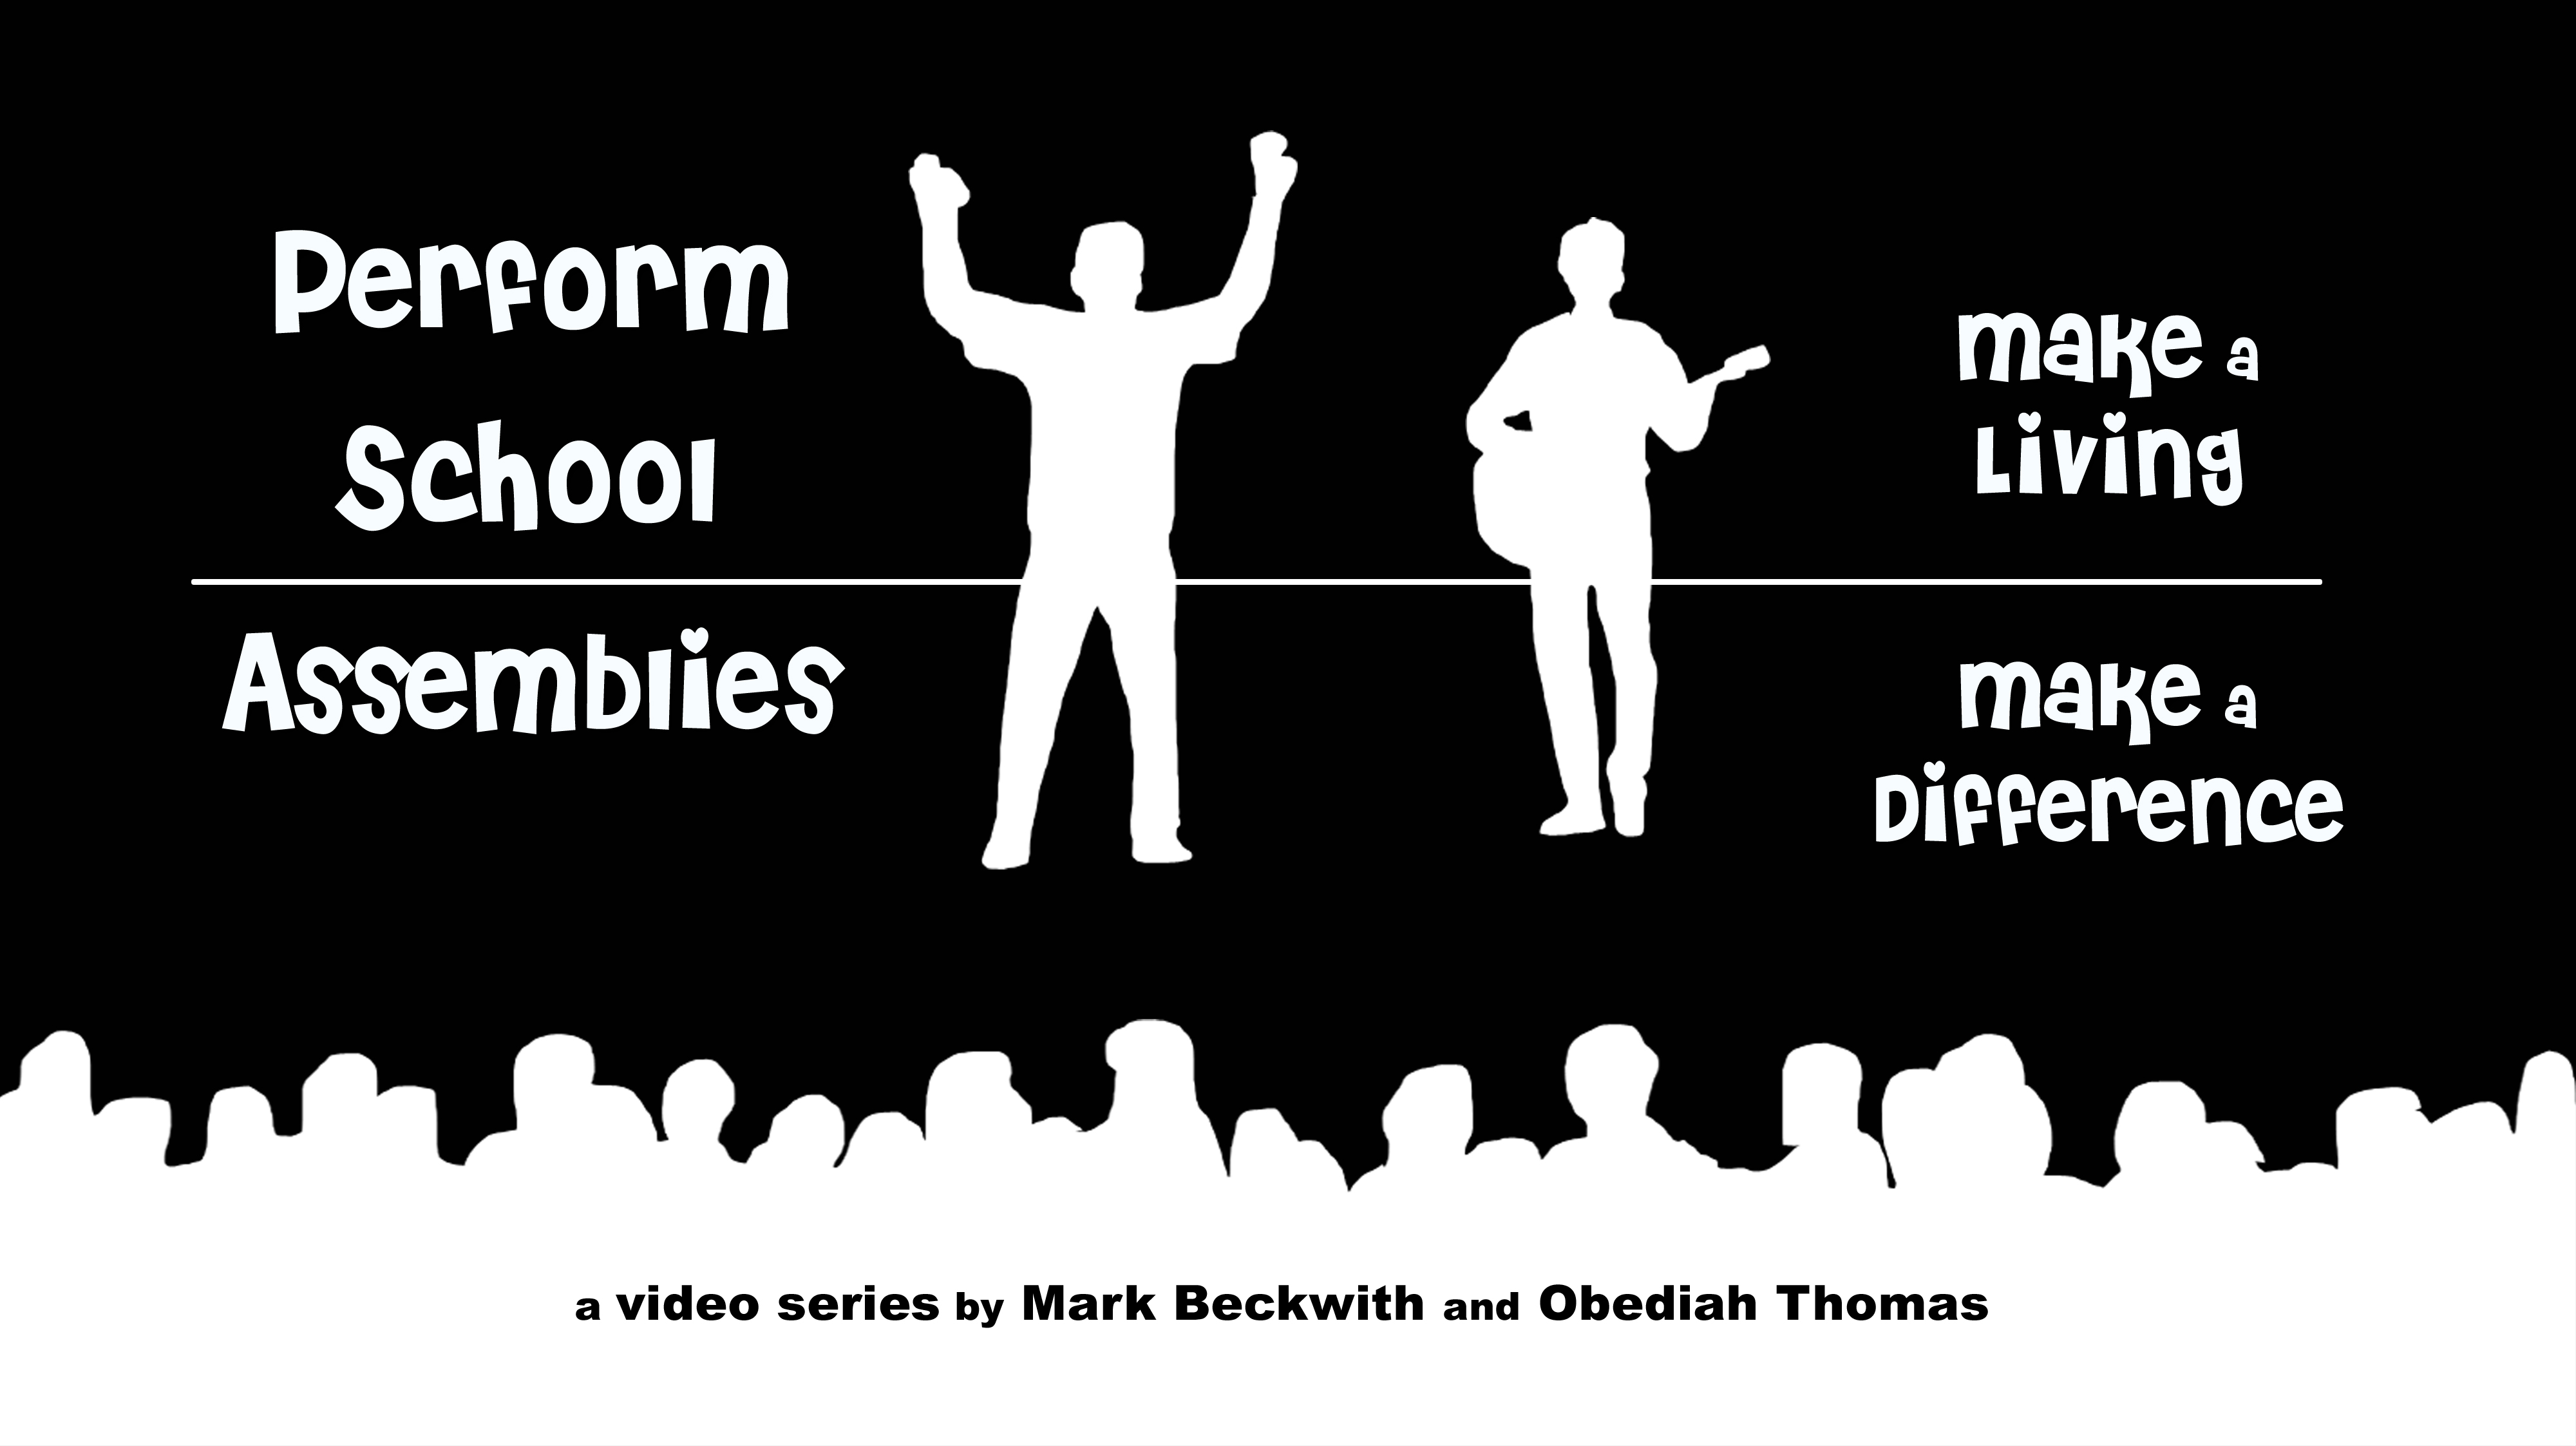 Perform School Assemblies - magic